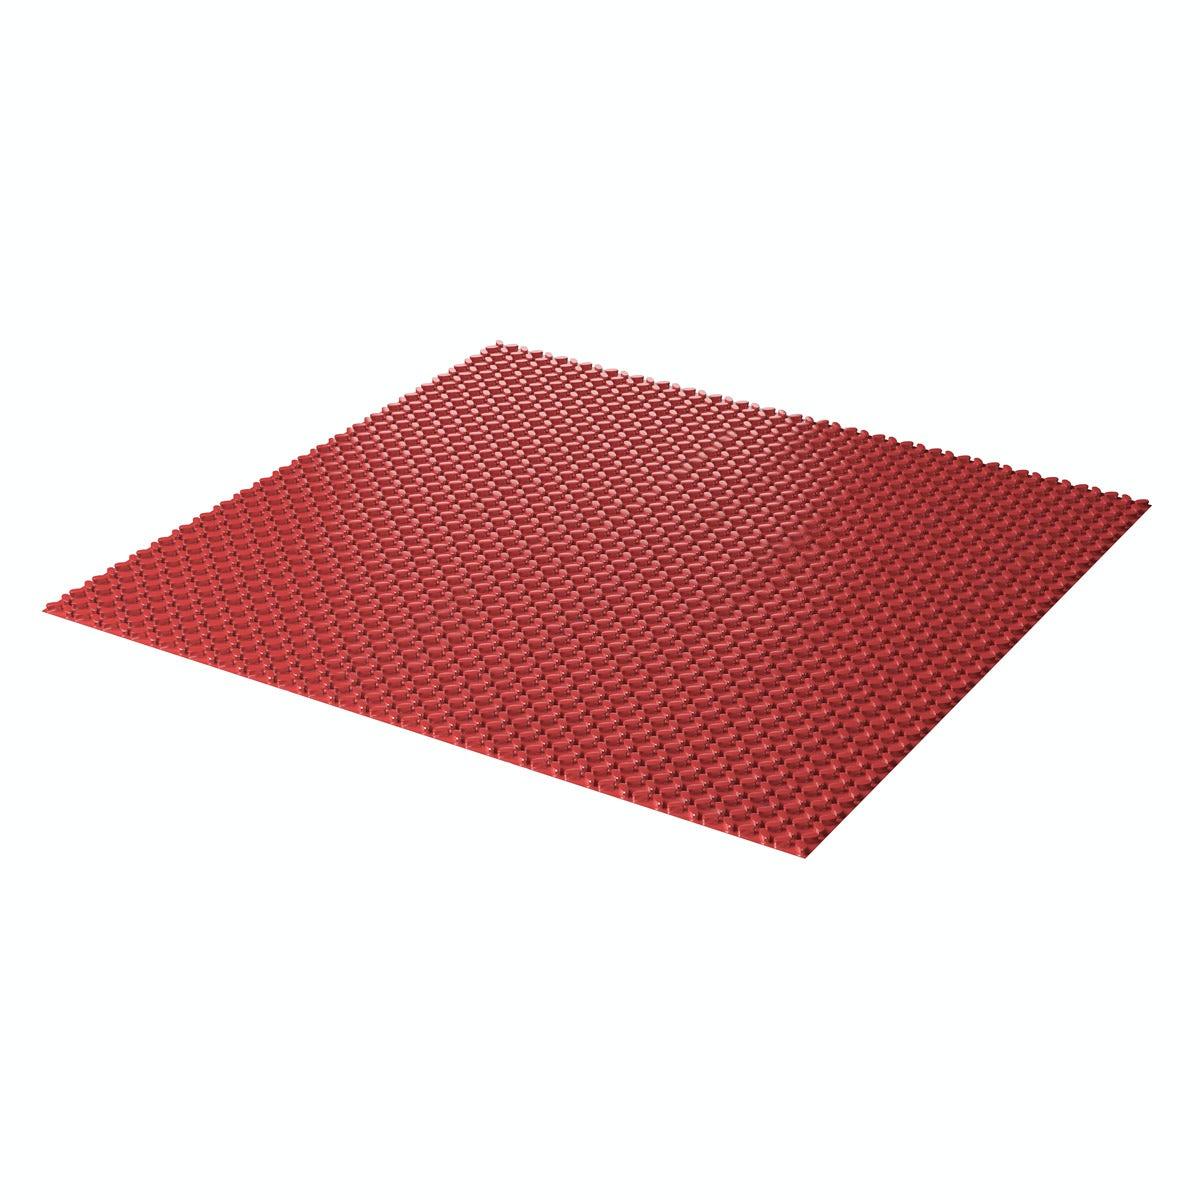 Warmup DCM-Pro mat